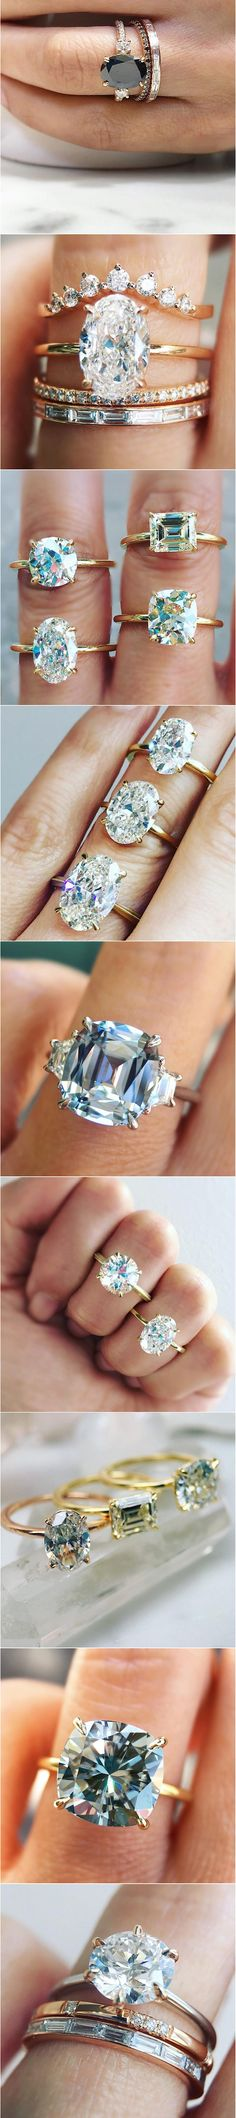 Jeweler Spotlight Check out these gorgeous (10) over @trabertgoldsmiths ✨ #luxury #privatejeweler #cushion #gia #cushioncut #nyc #cushions #theknot #engaged #ido #diamondband #happiness #diamondring #proposal #isaidyes #diamonds #bigdiamonds #platinum #thatsdarling #loverly #bullets #bling #newyork #abouttosayyes #apbling #thediamondsgirl #jewelryjournal #champagnegem #wifeyofficial